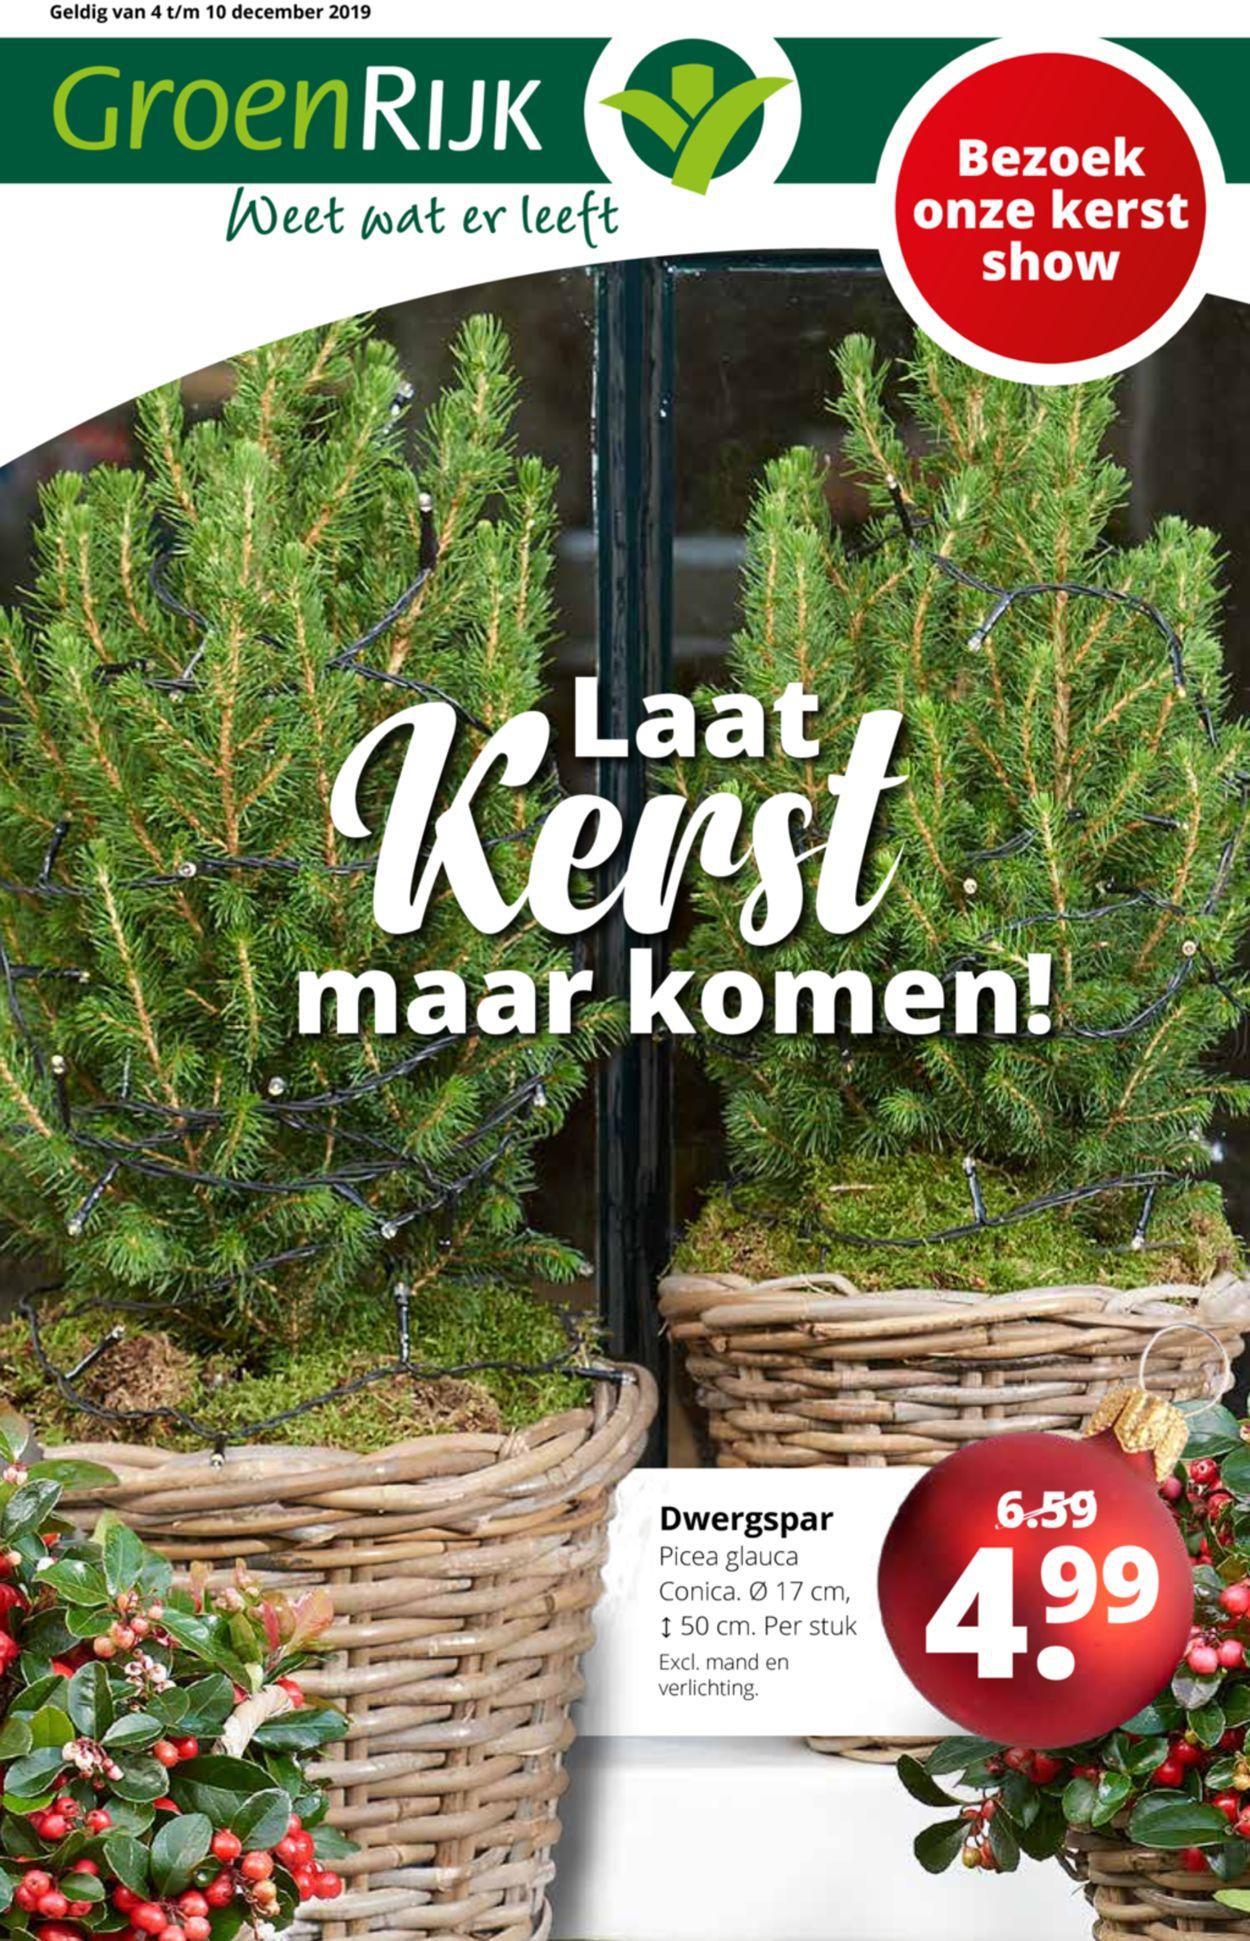 GroenRijk kerstaanbieding 2019 Folder - 03.12-10.12.2019